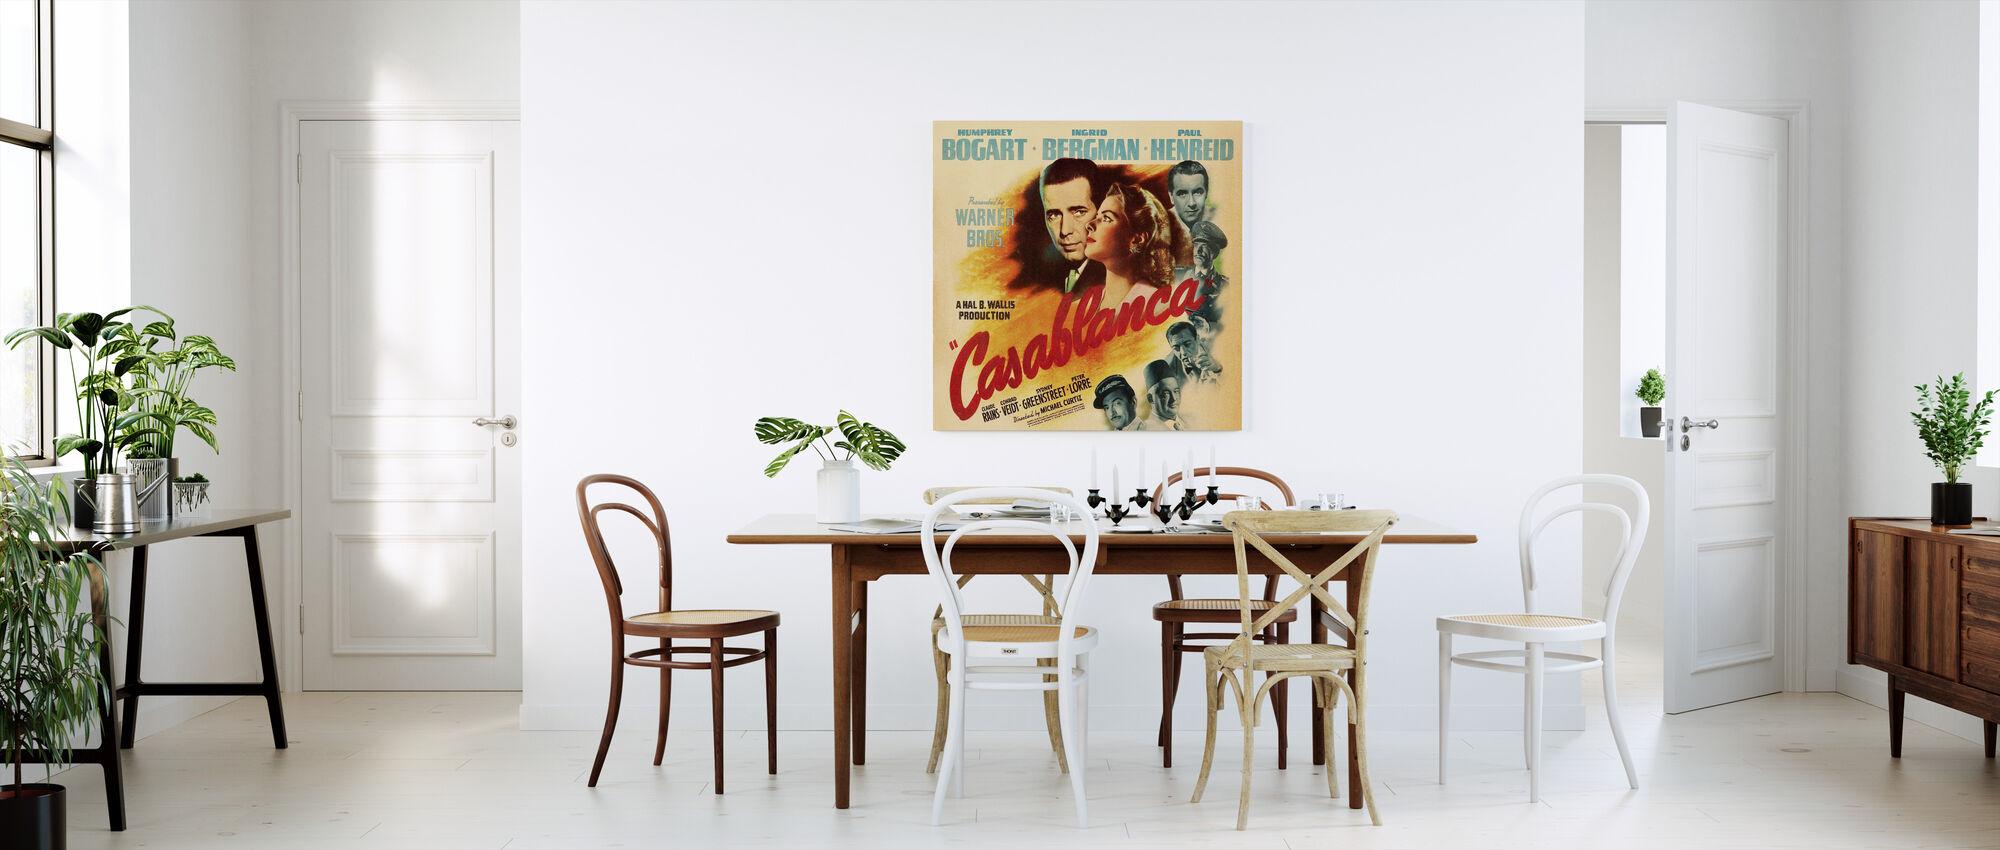 movie poster casablanca leinwandbild nach ma photowall. Black Bedroom Furniture Sets. Home Design Ideas